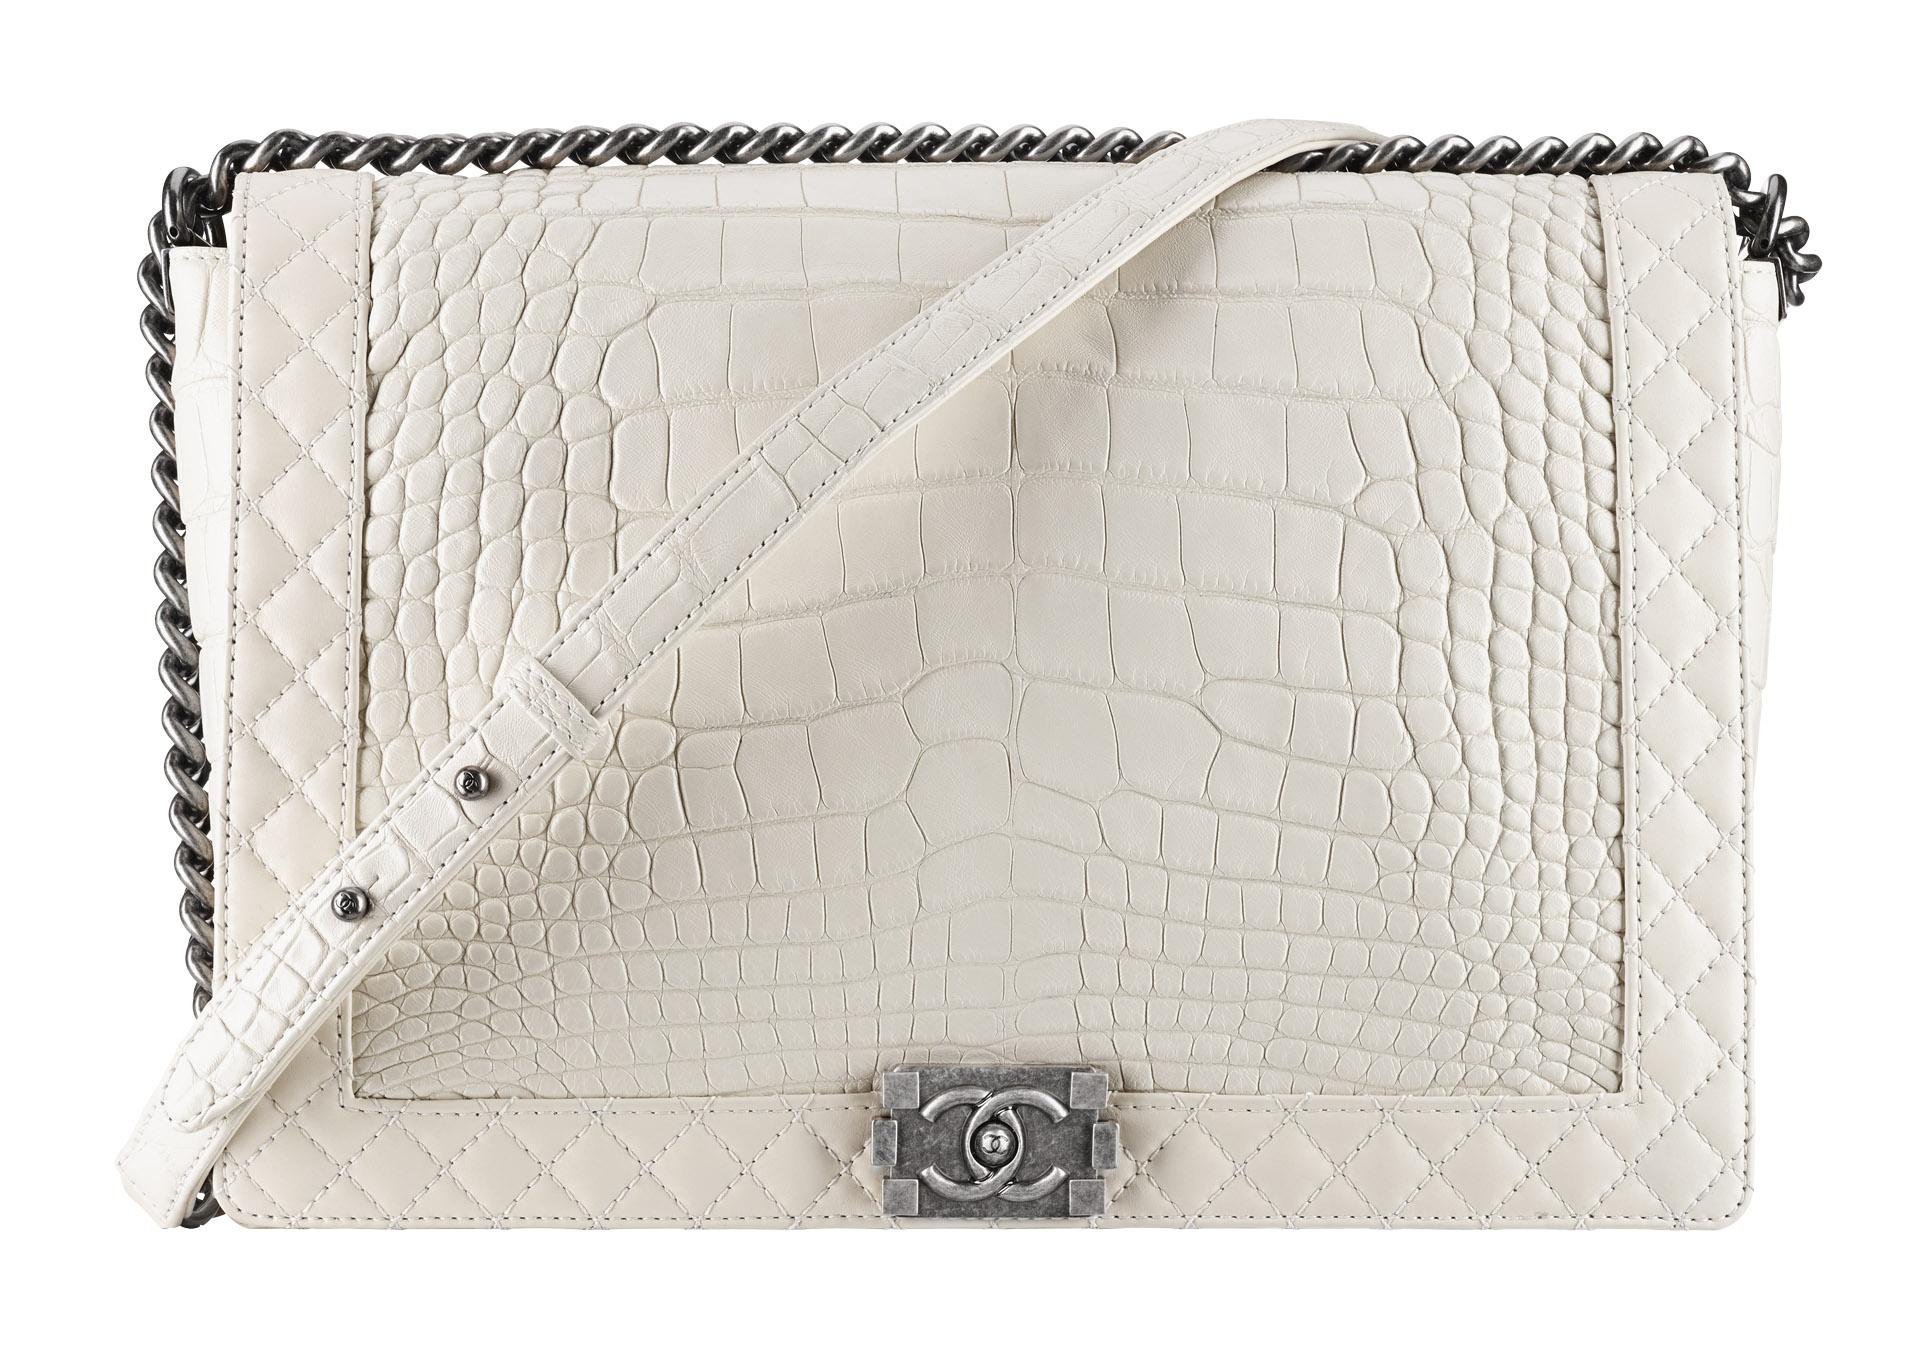 6 - Ivory-exotic-leather-BOY-CHANEL-bag